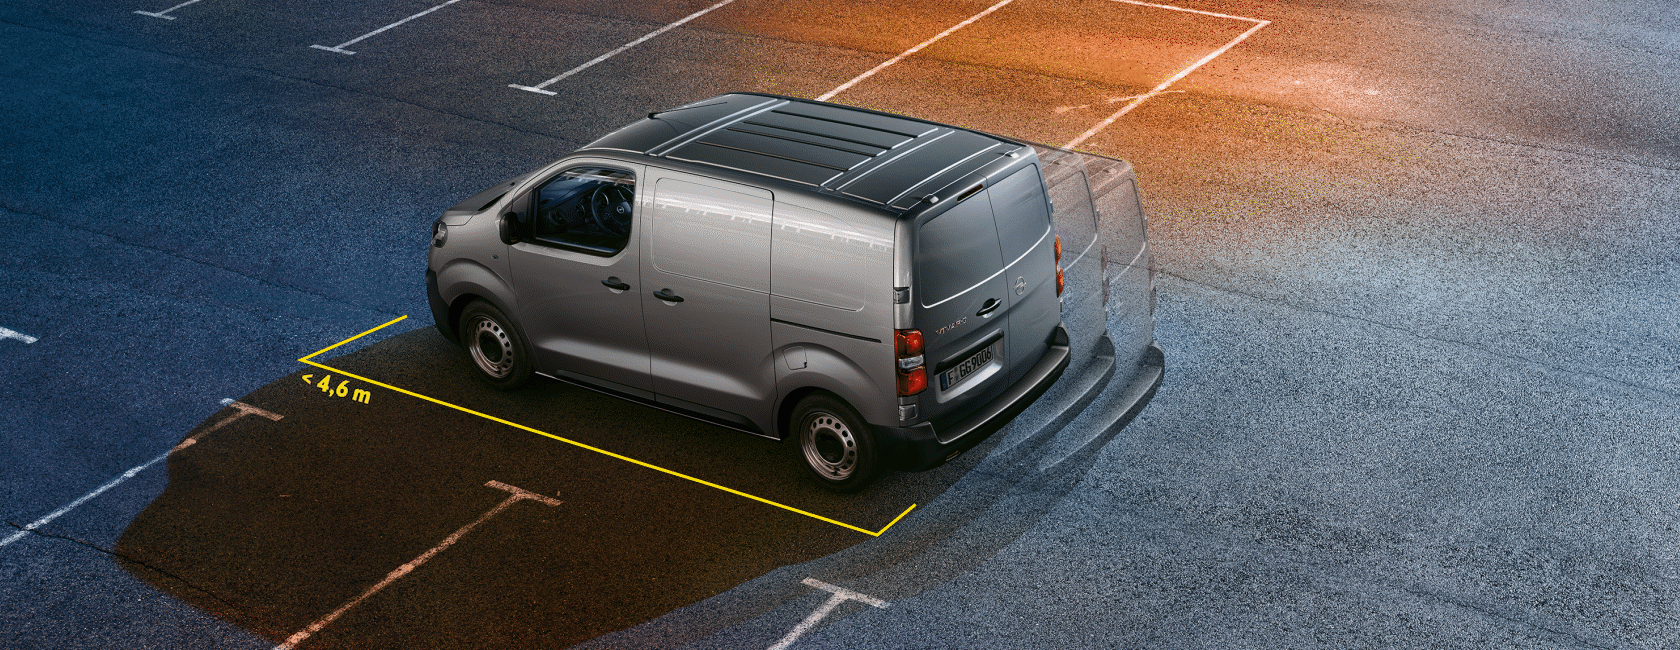 Opel_vivaro_dimensions_lines_21x9